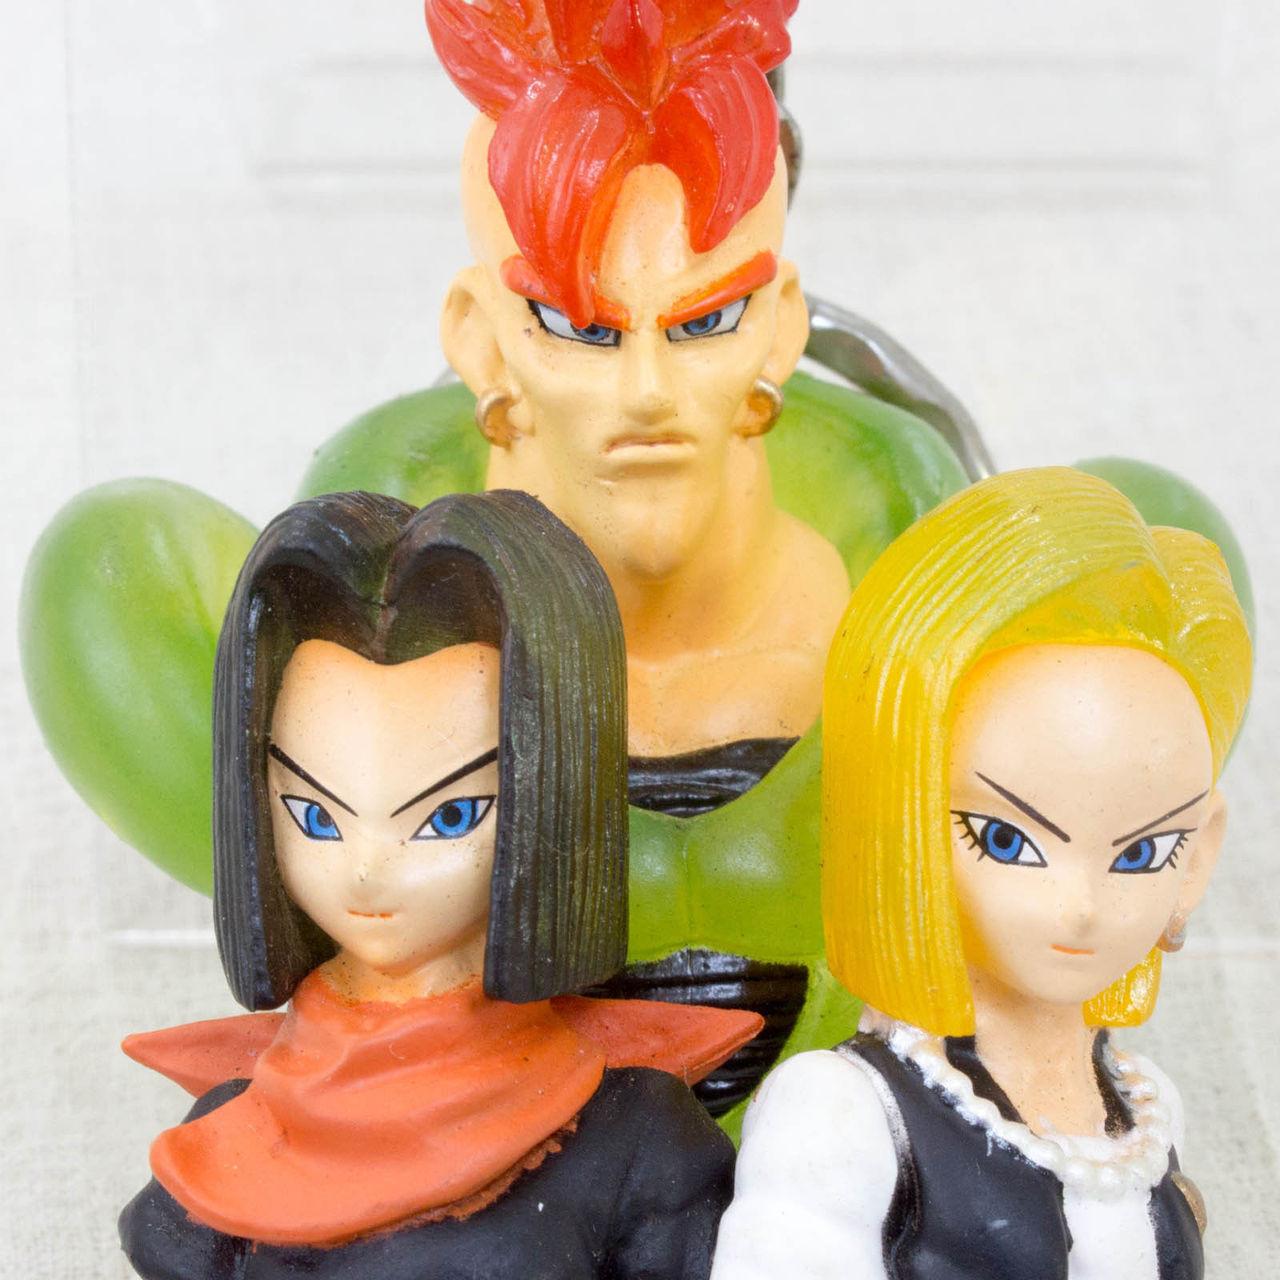 Dragon Ball Z Andoroid 16 17 18 Mascot Figure Clear Type Key Chain Japan Anime